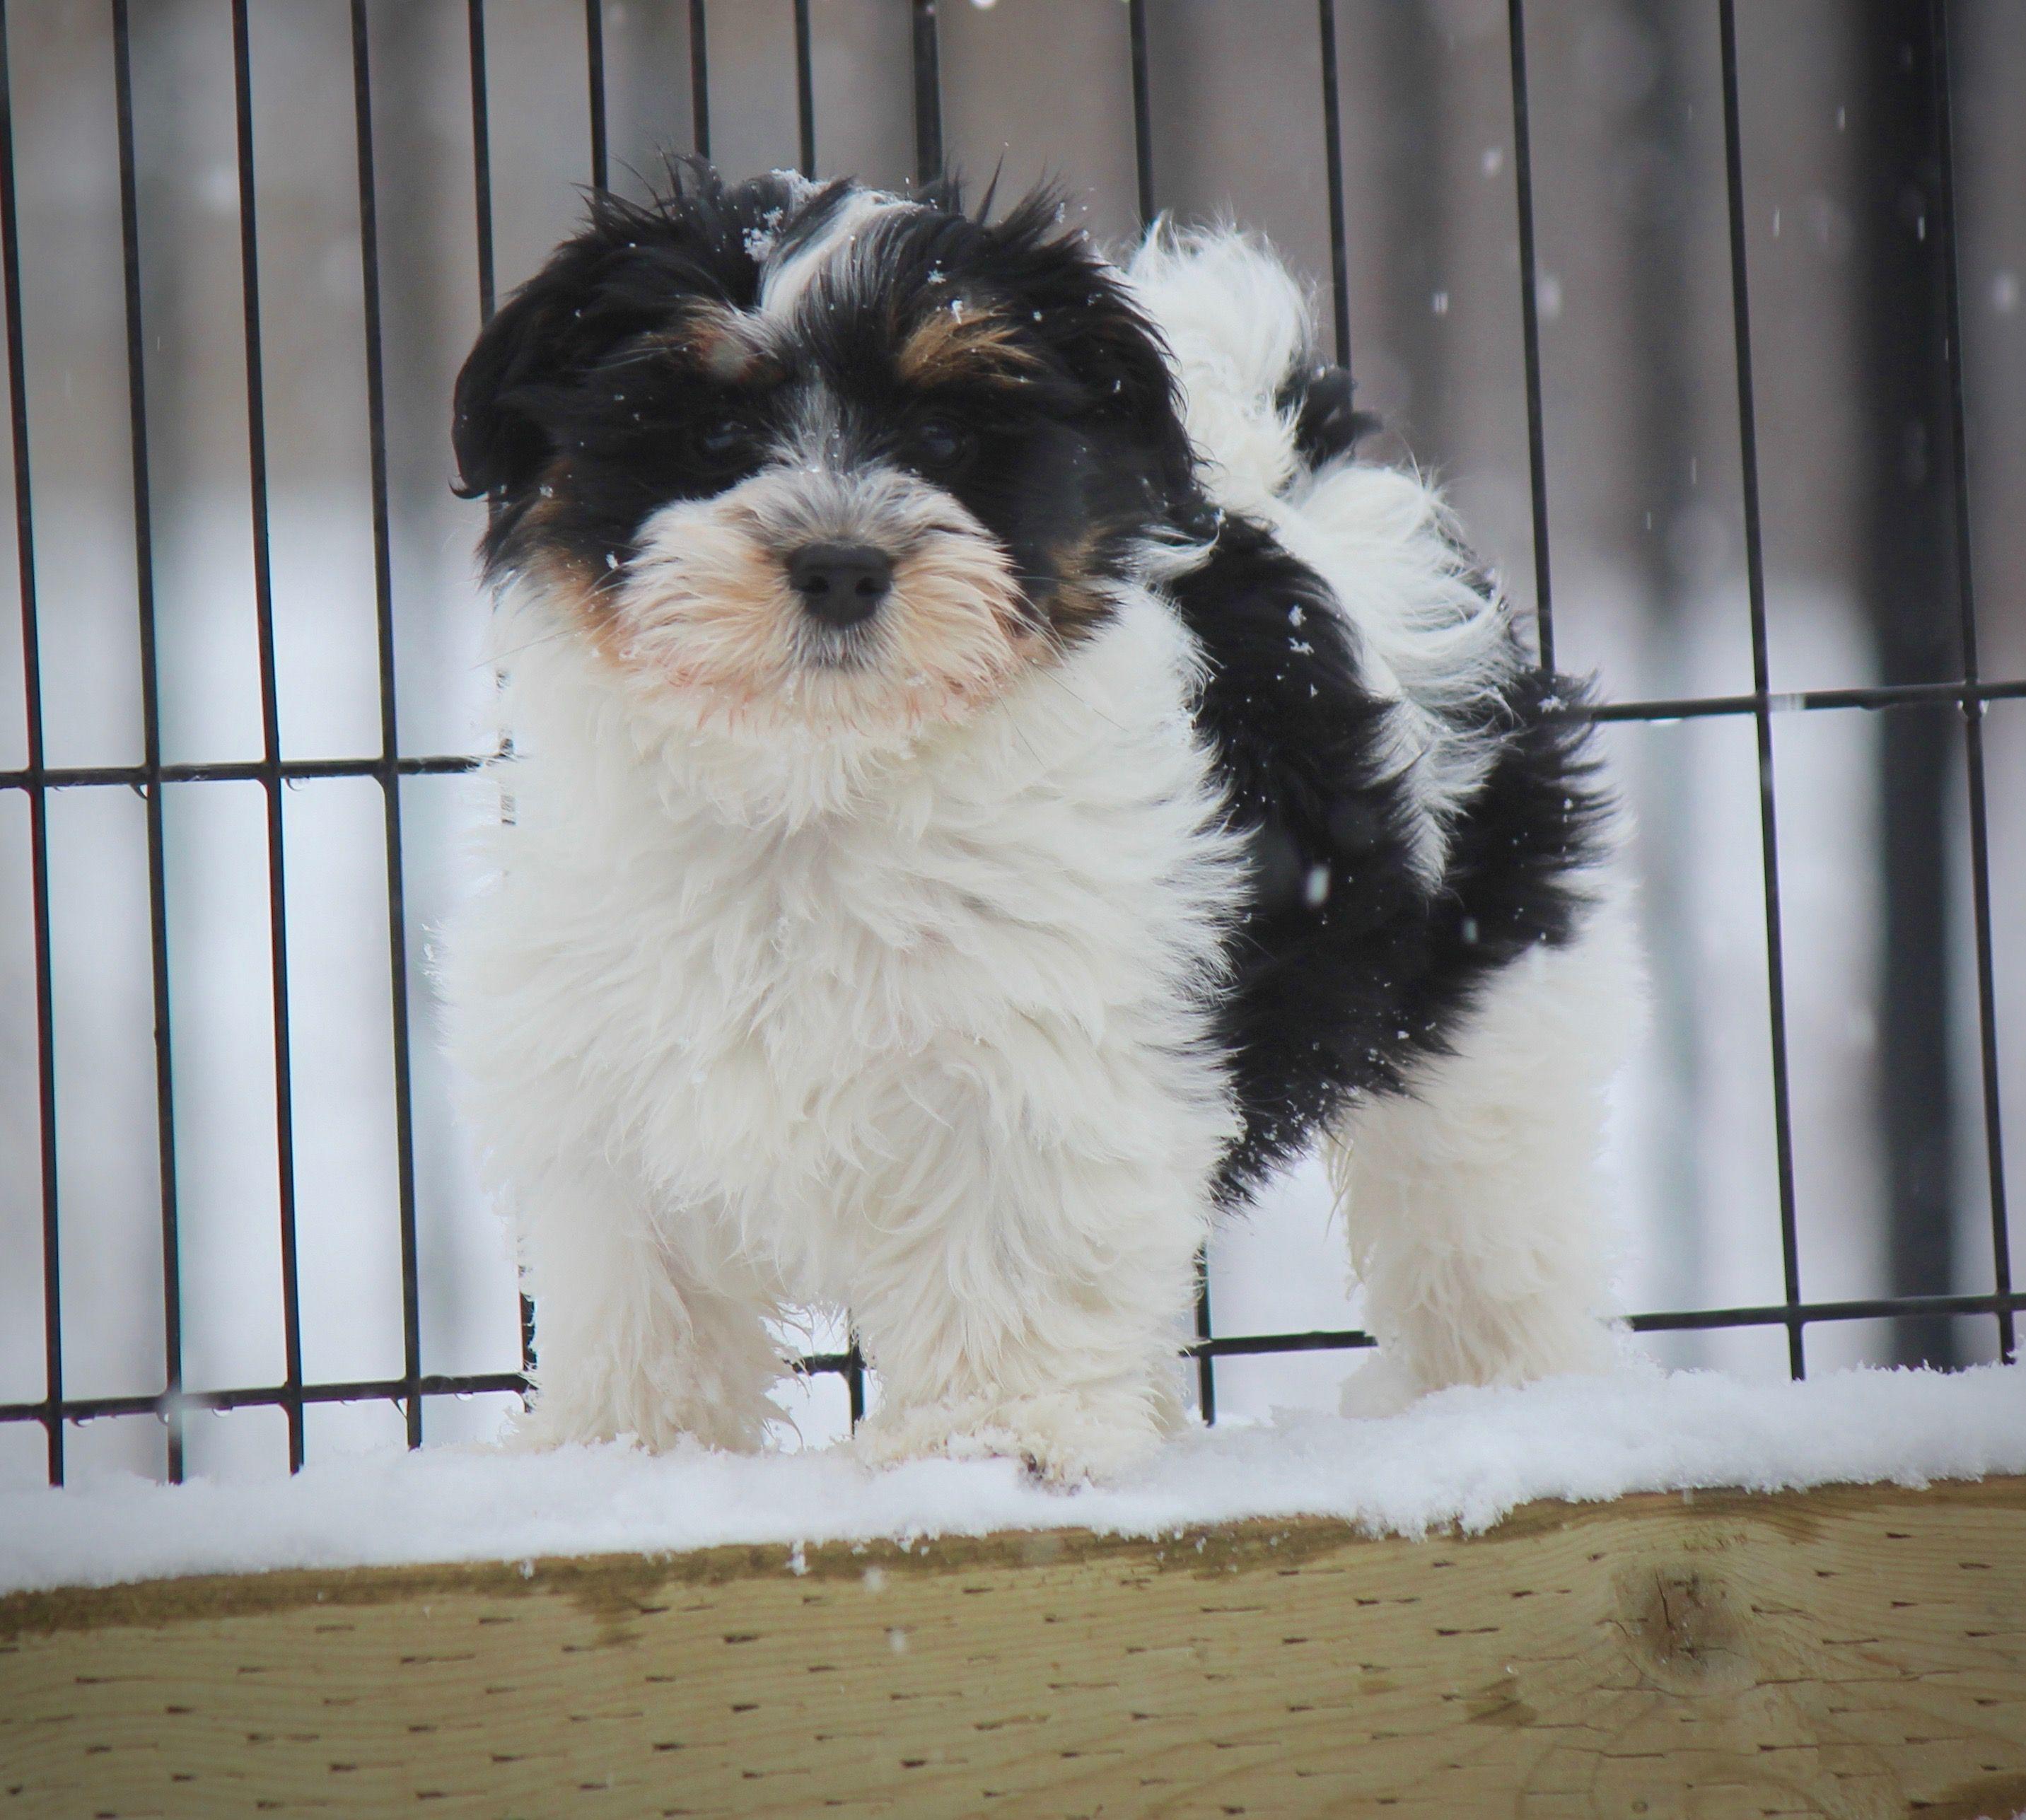 Cute Little Bichon Shih Tzu Pup From Babybarks Ca Our Shichon